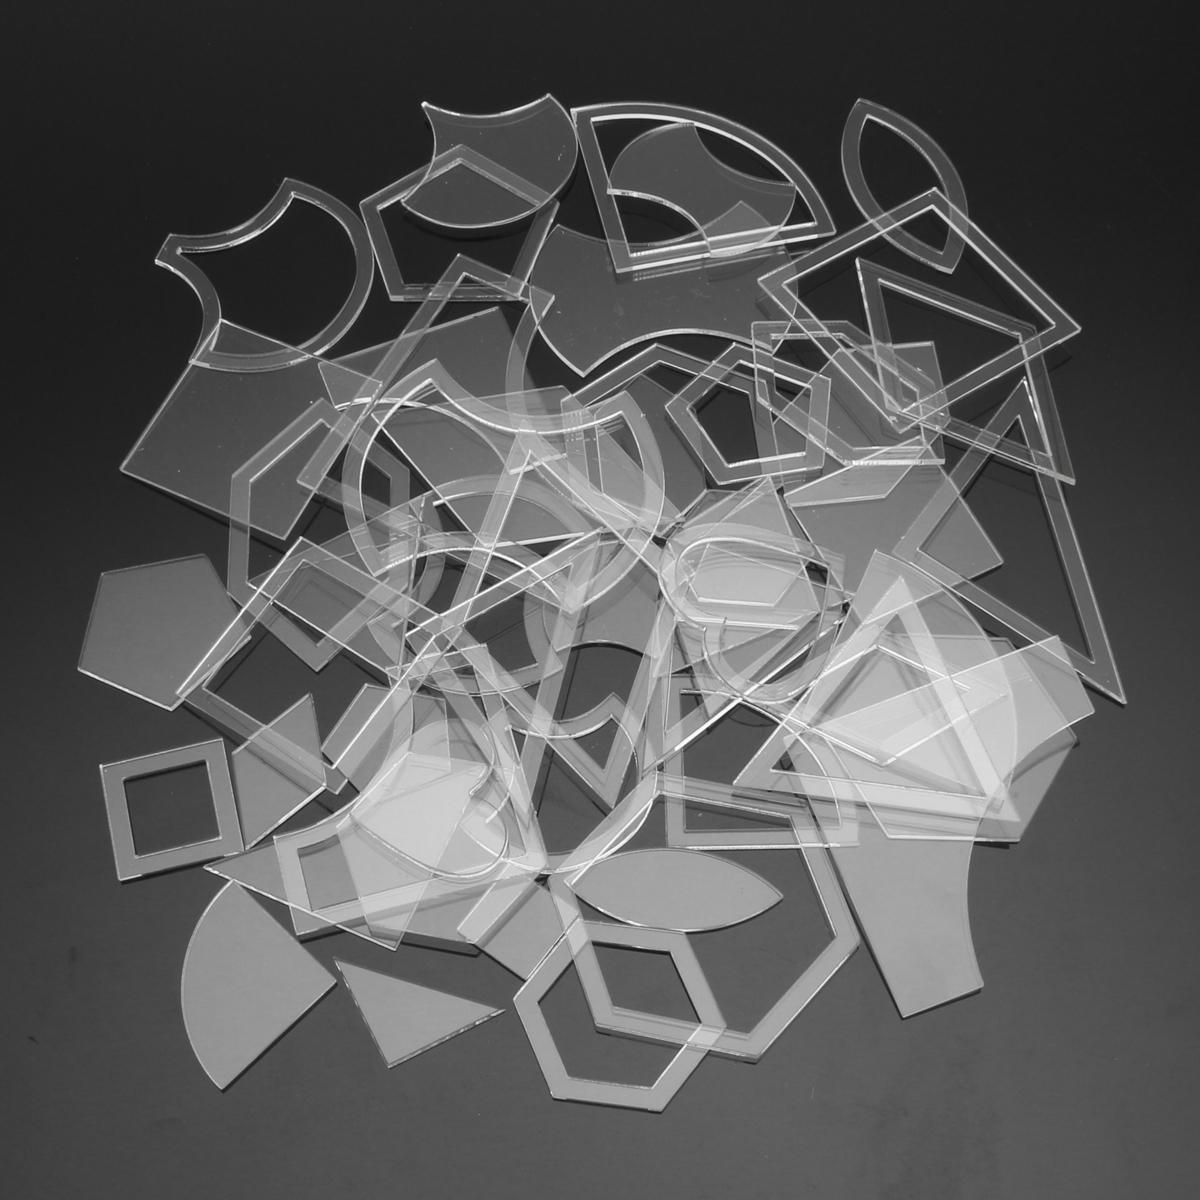 Buy 54pcs Acrylic Quilting Templates Multi Shapes Ruler DIY Sewing ...